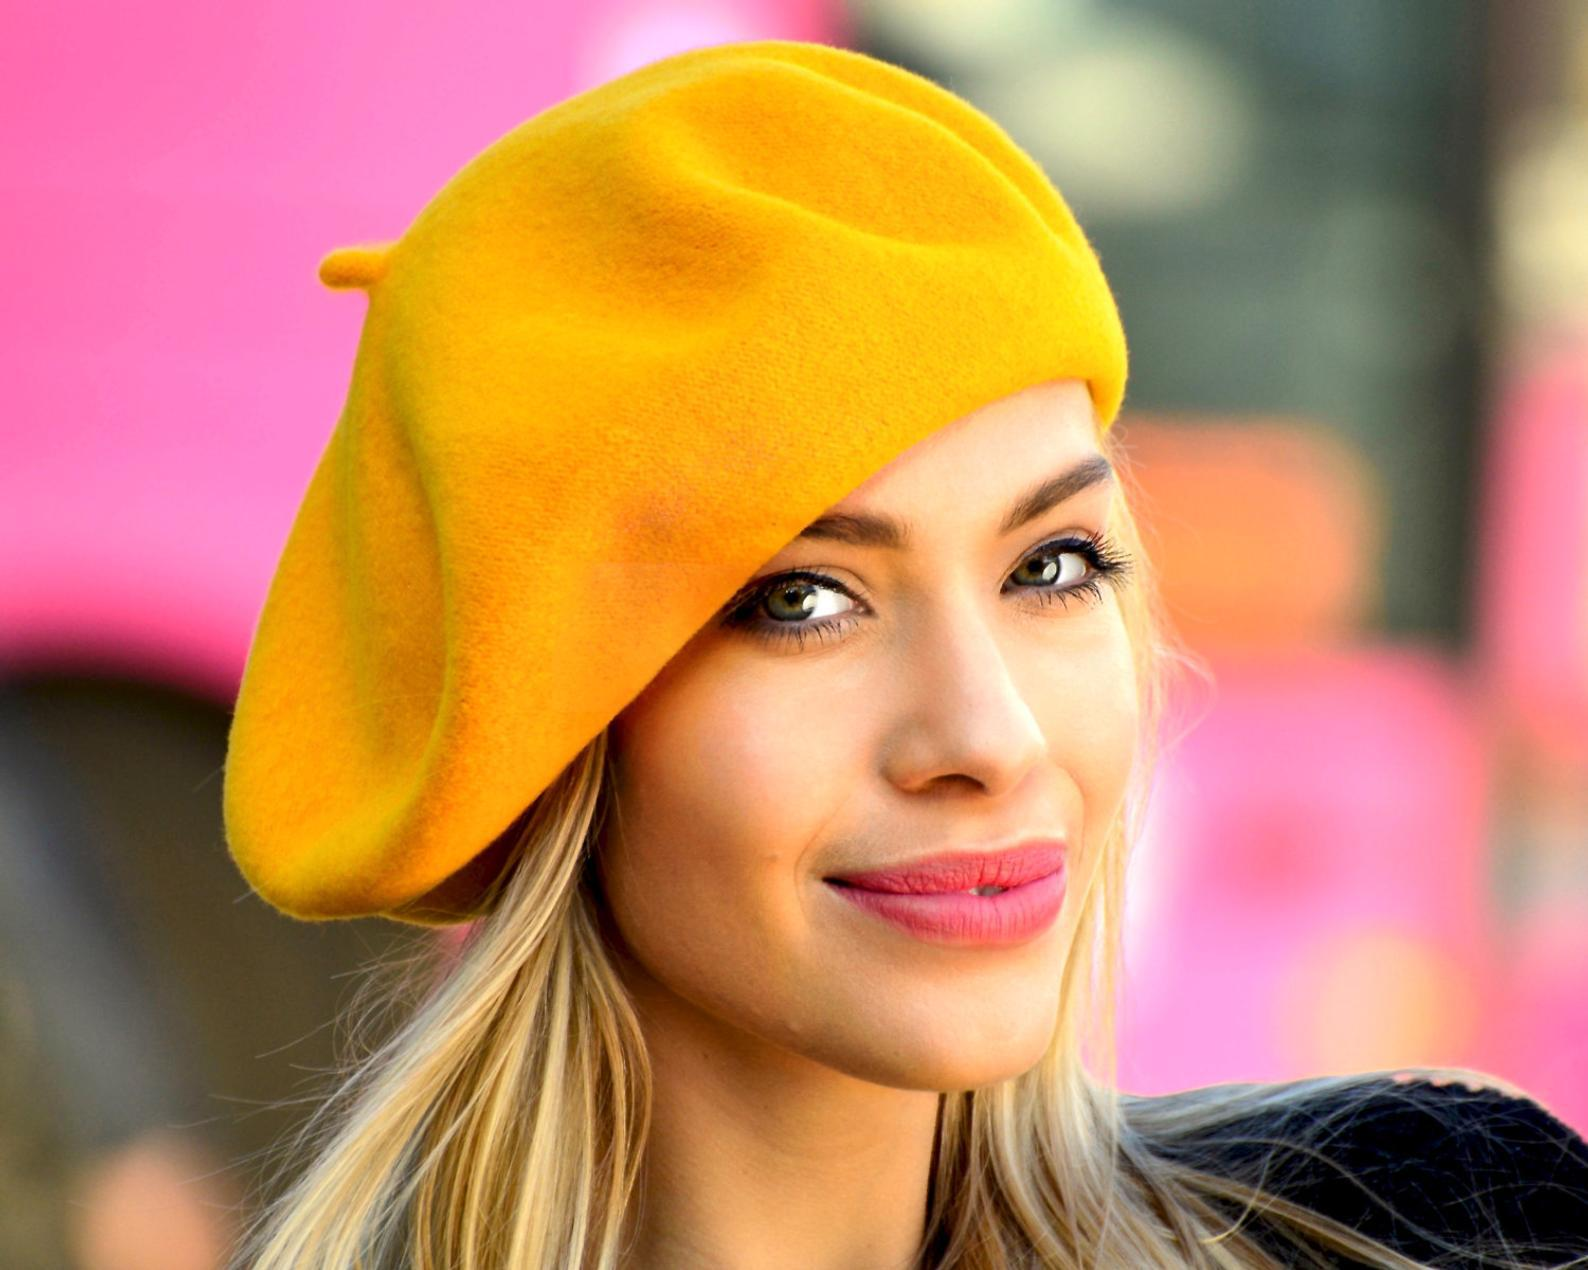 Autumn Winter Women Casual Wool Beret Hat Thick Large Hats Female Chic Felt Plain Blank Berets Hat 2019 Hot